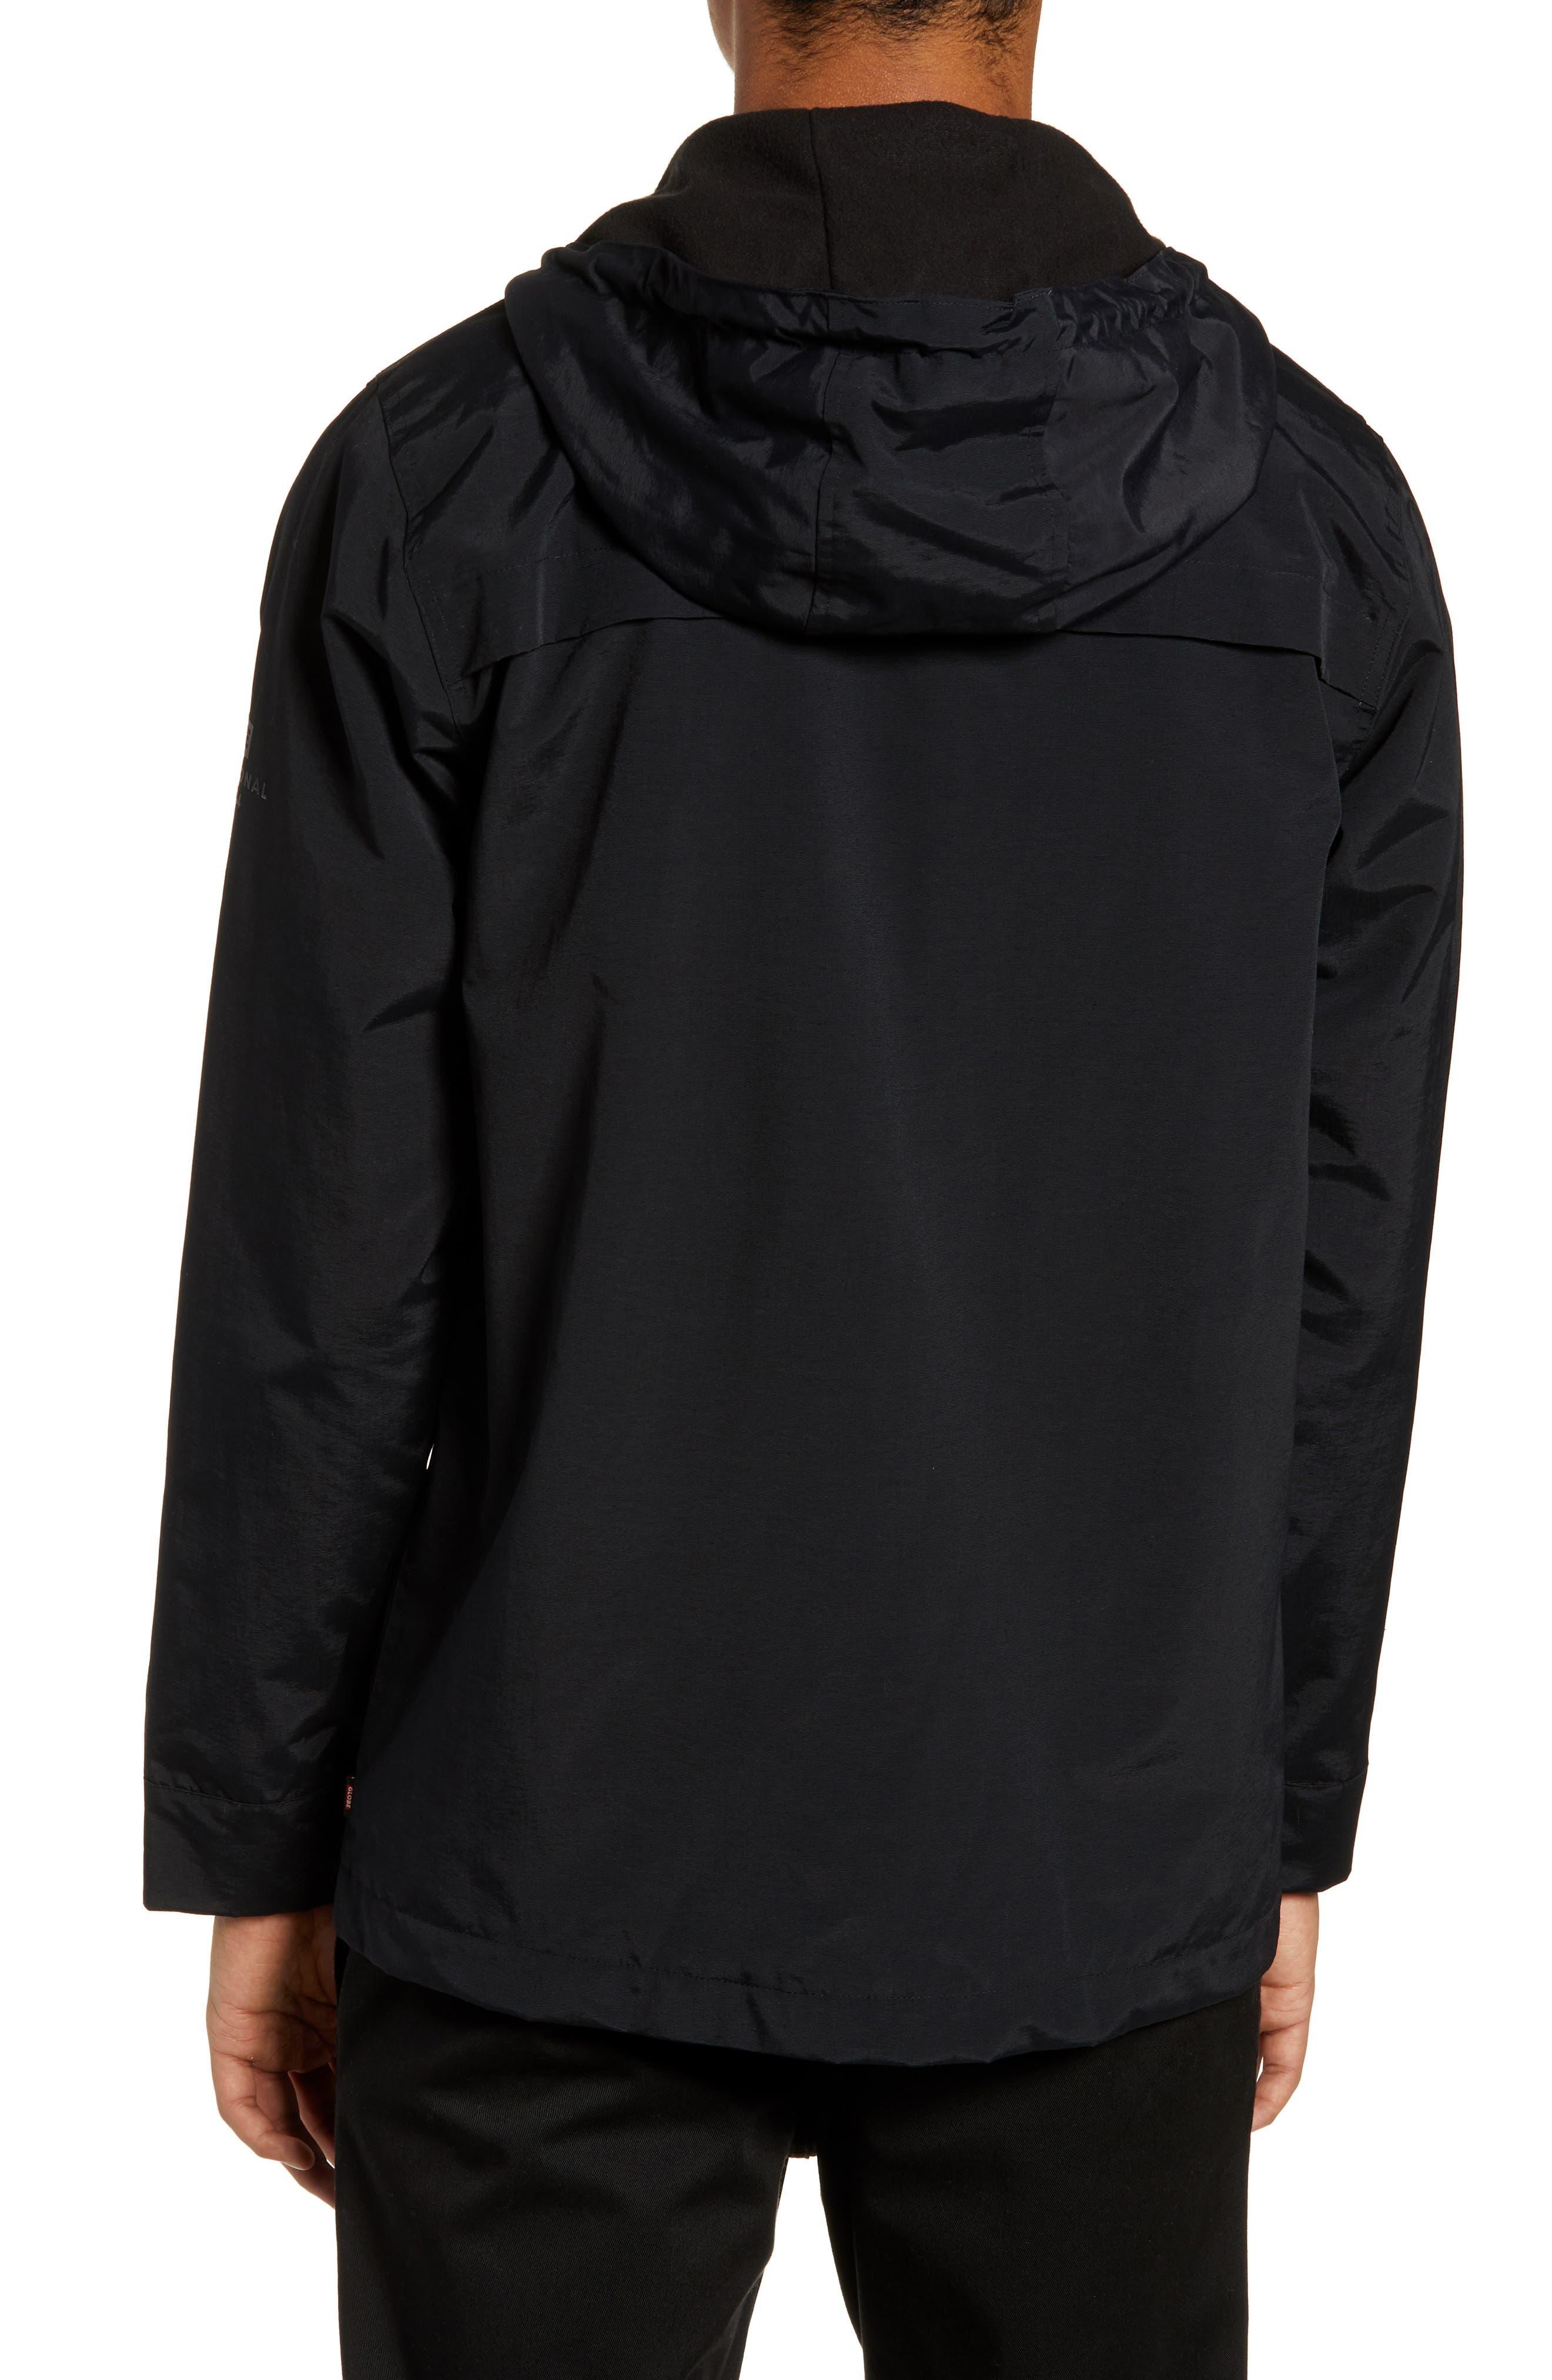 Goodstock Utility Jacket,                             Alternate thumbnail 2, color,                             BLACK